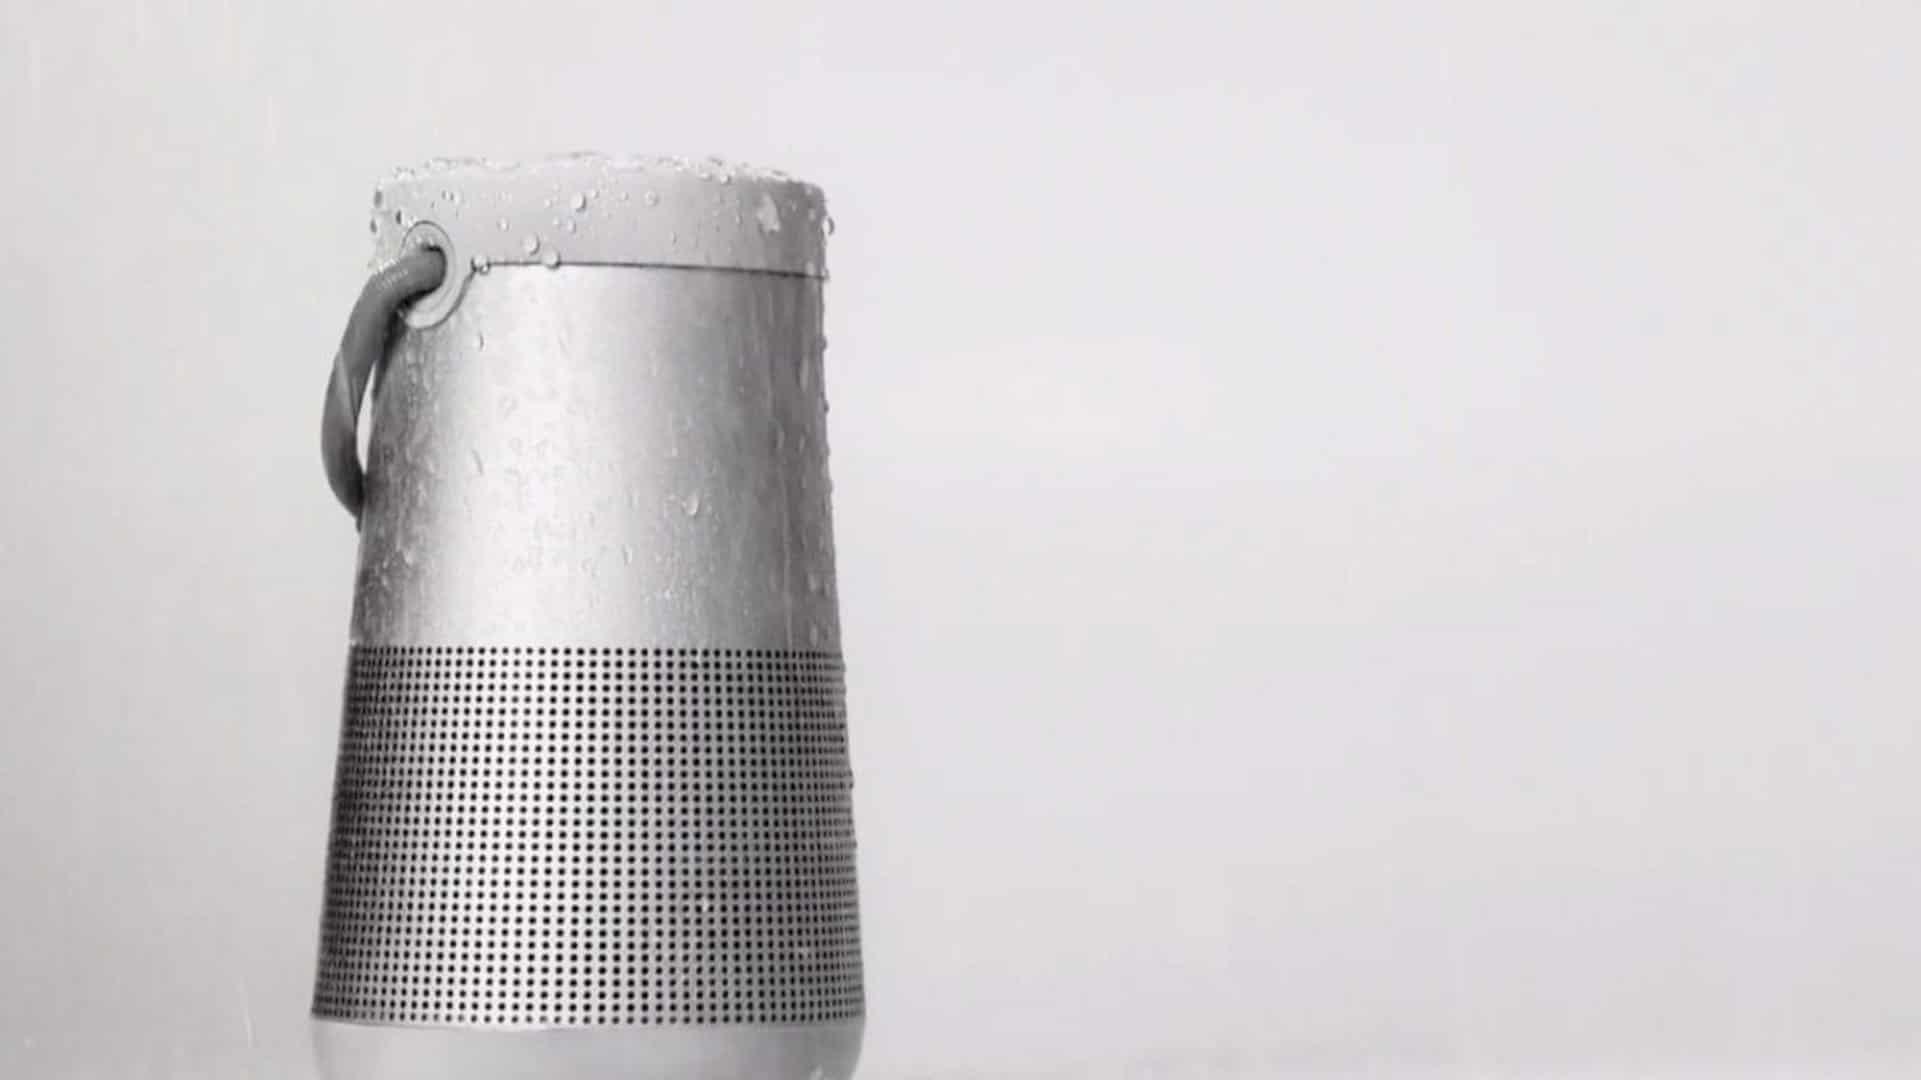 SoundLink Revolve 2